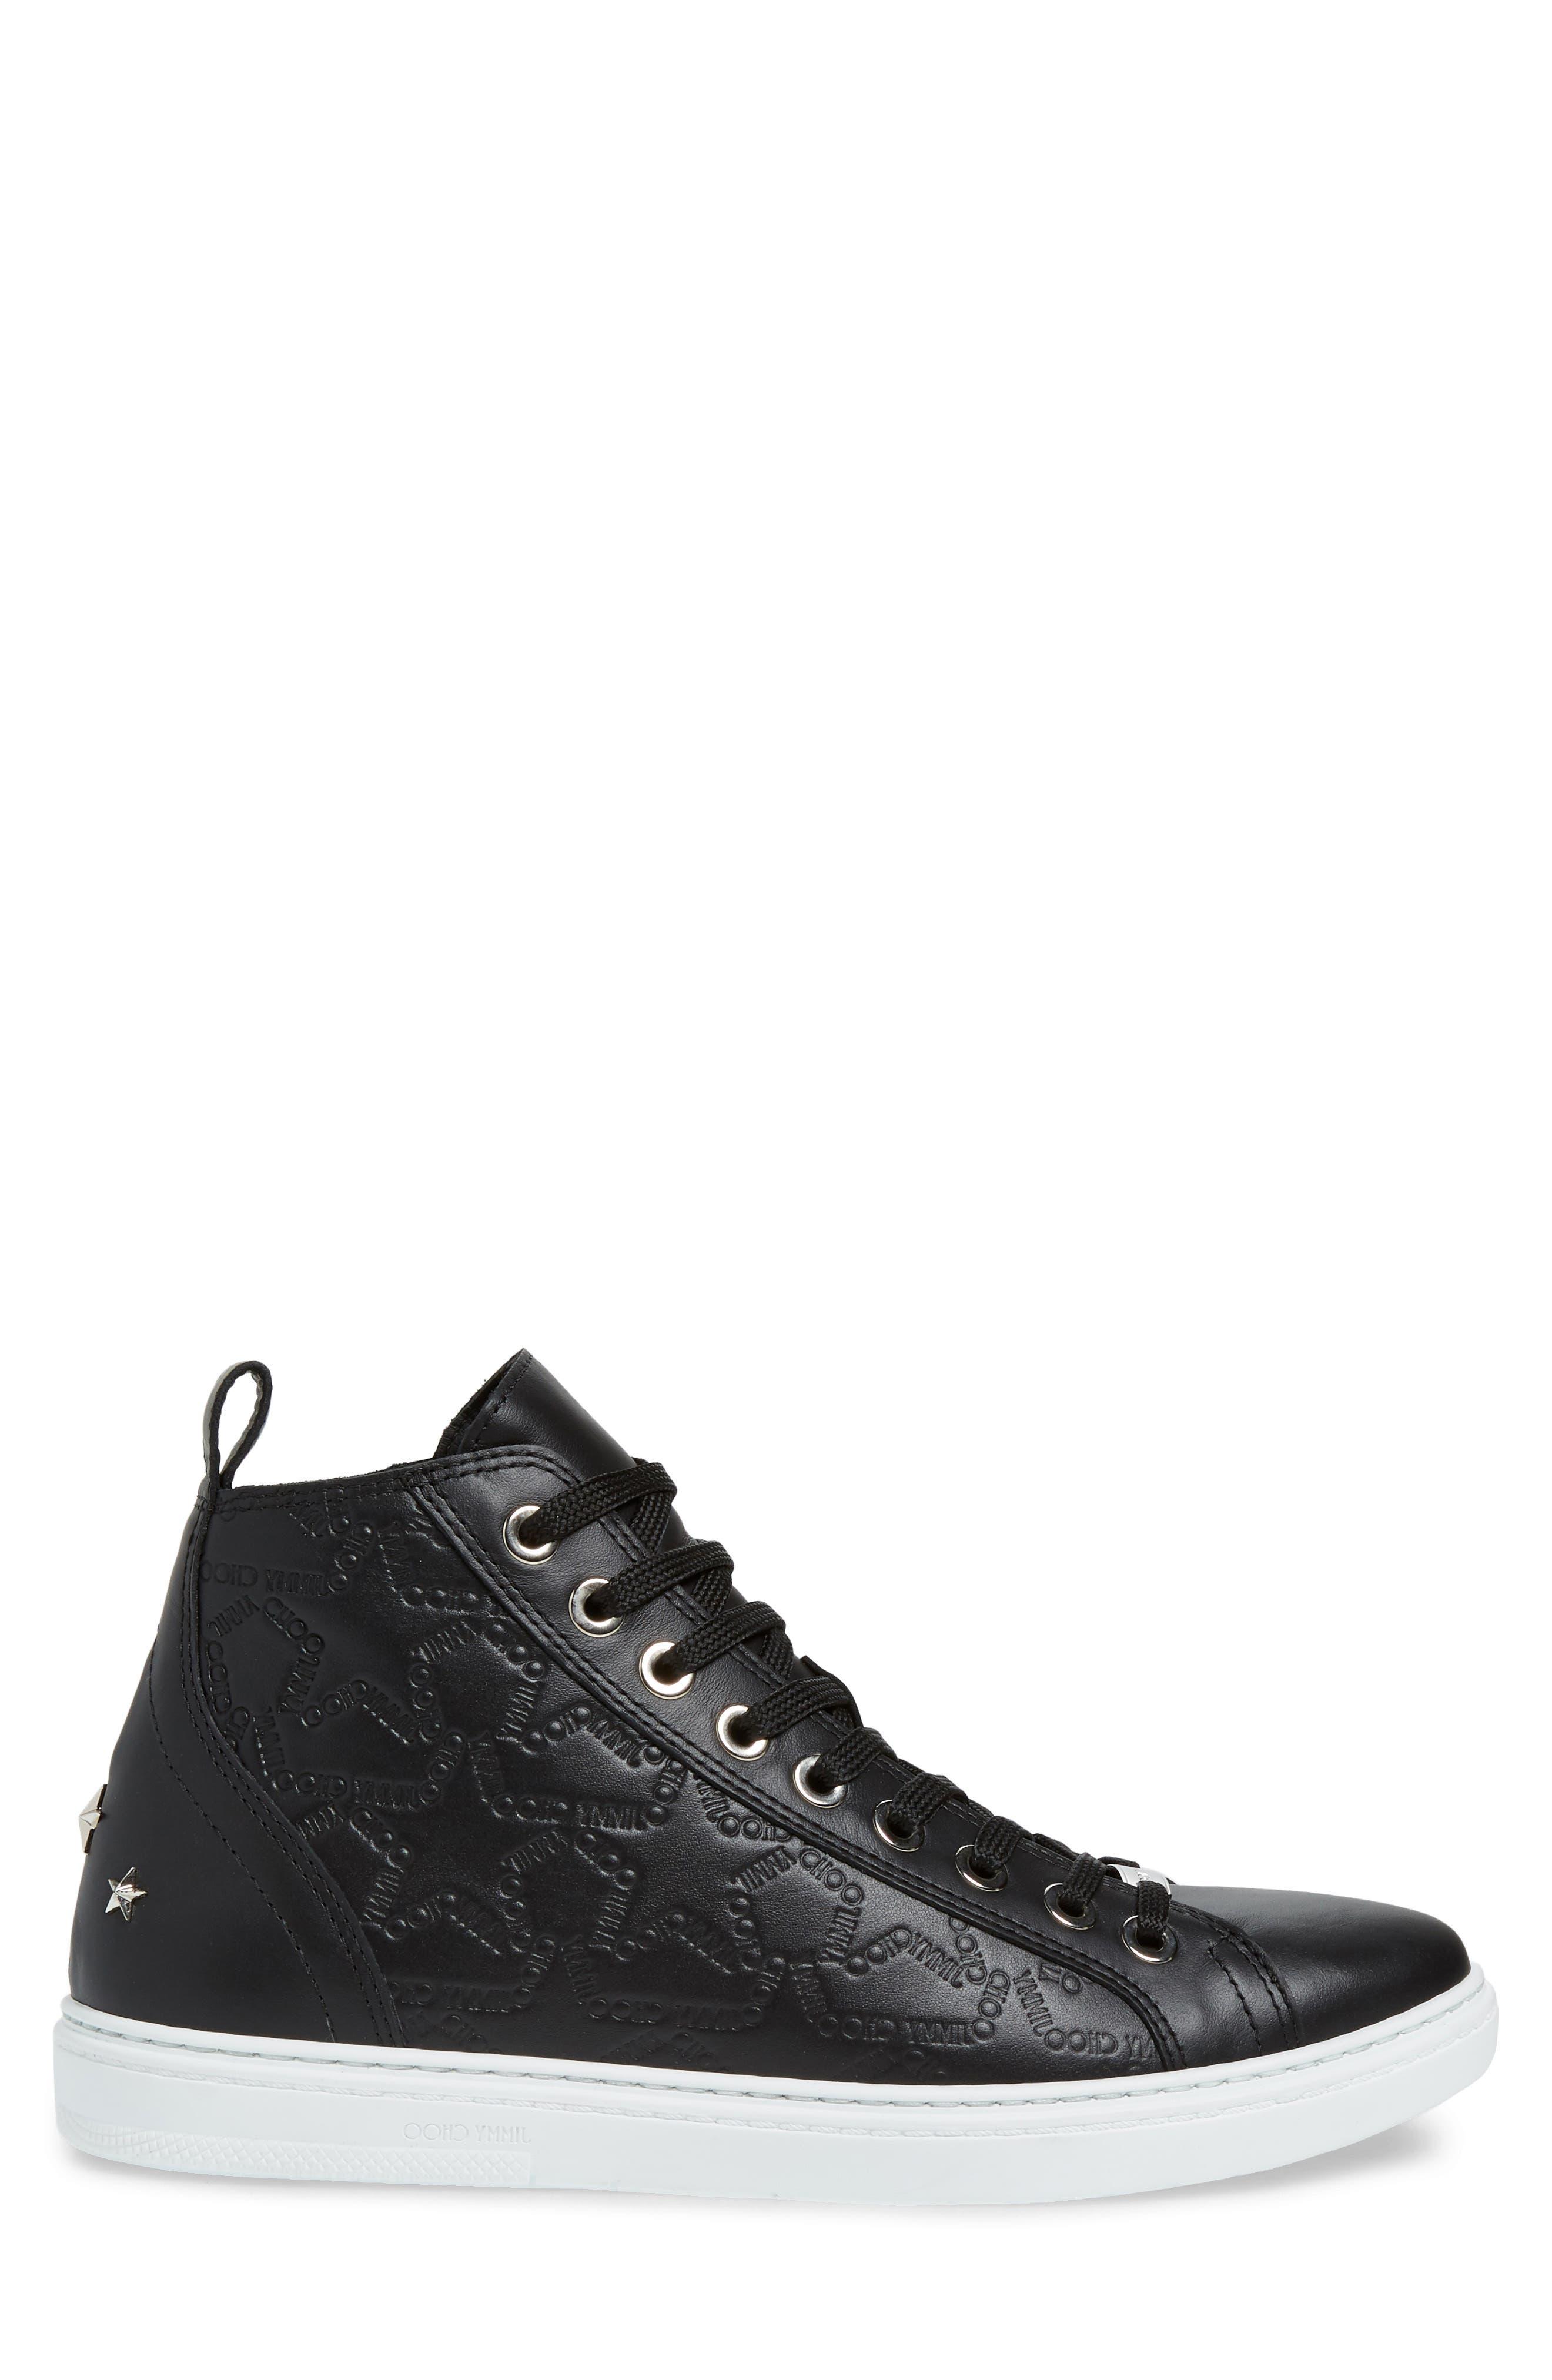 JIMMY CHOO, Colt High Top Sneaker, Alternate thumbnail 3, color, BLACK